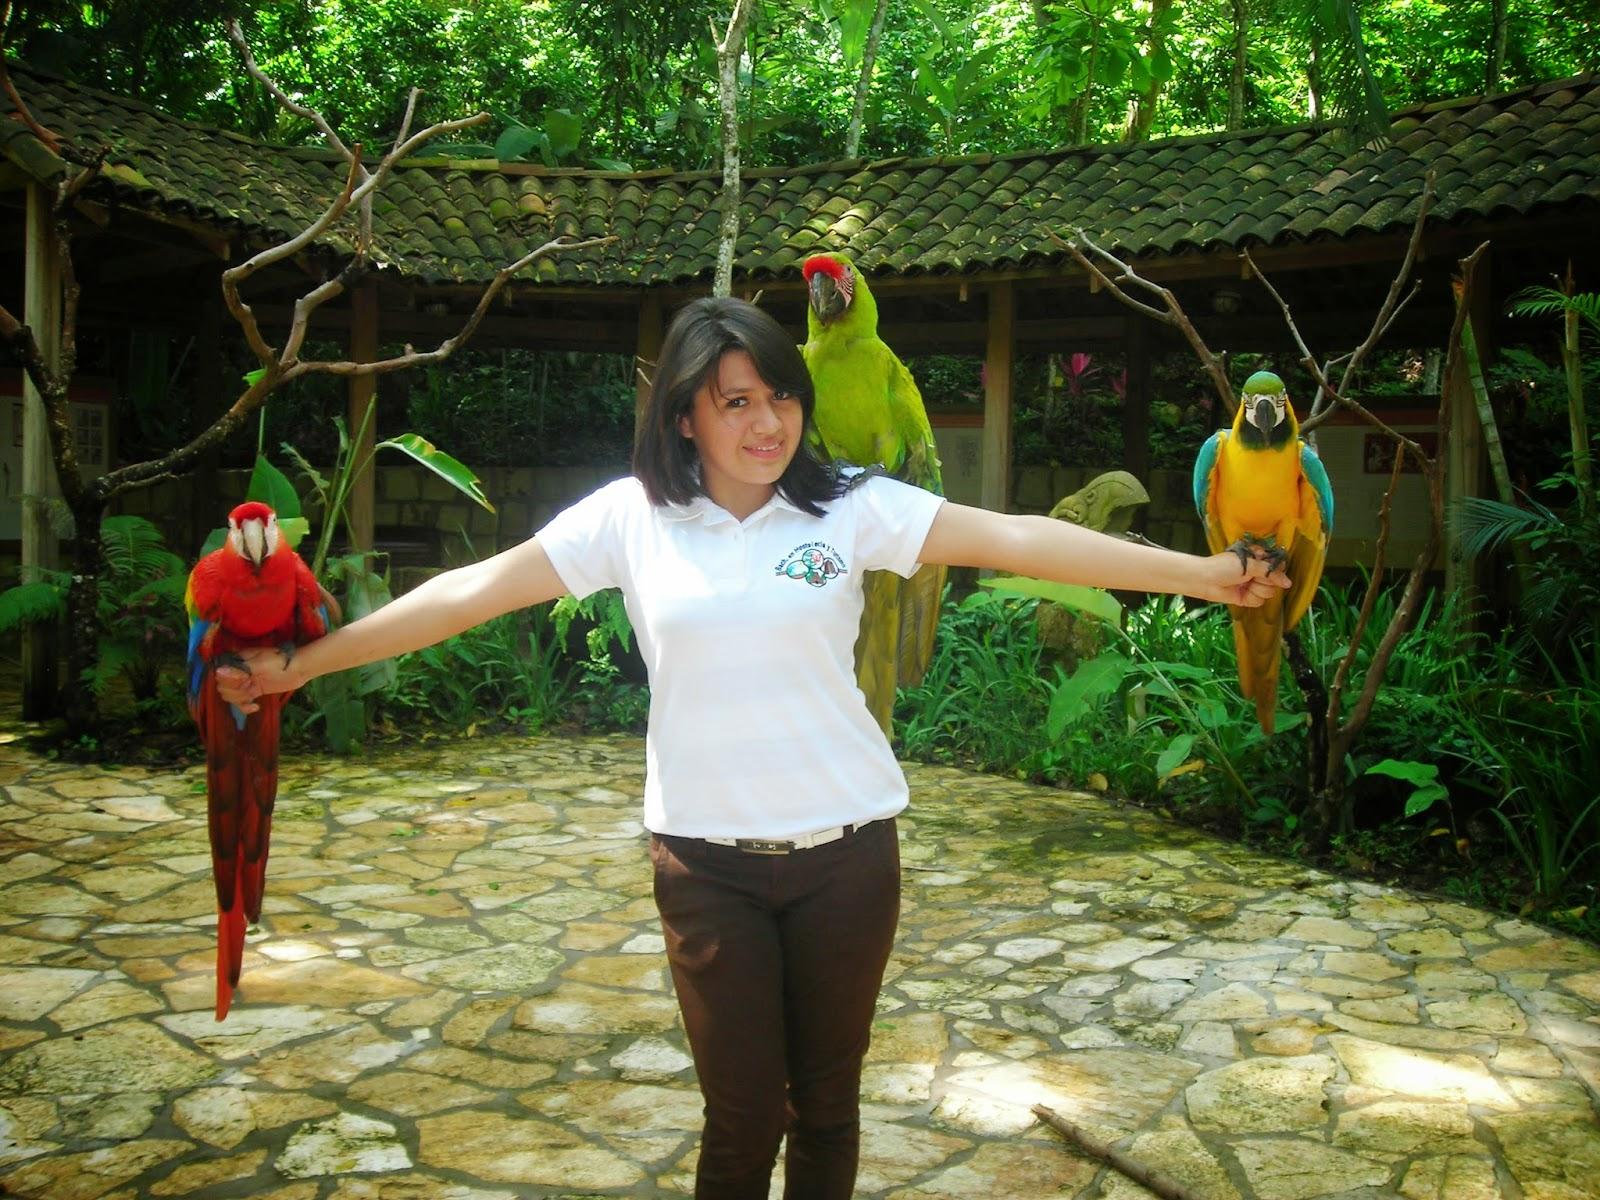 Parque-de-aves